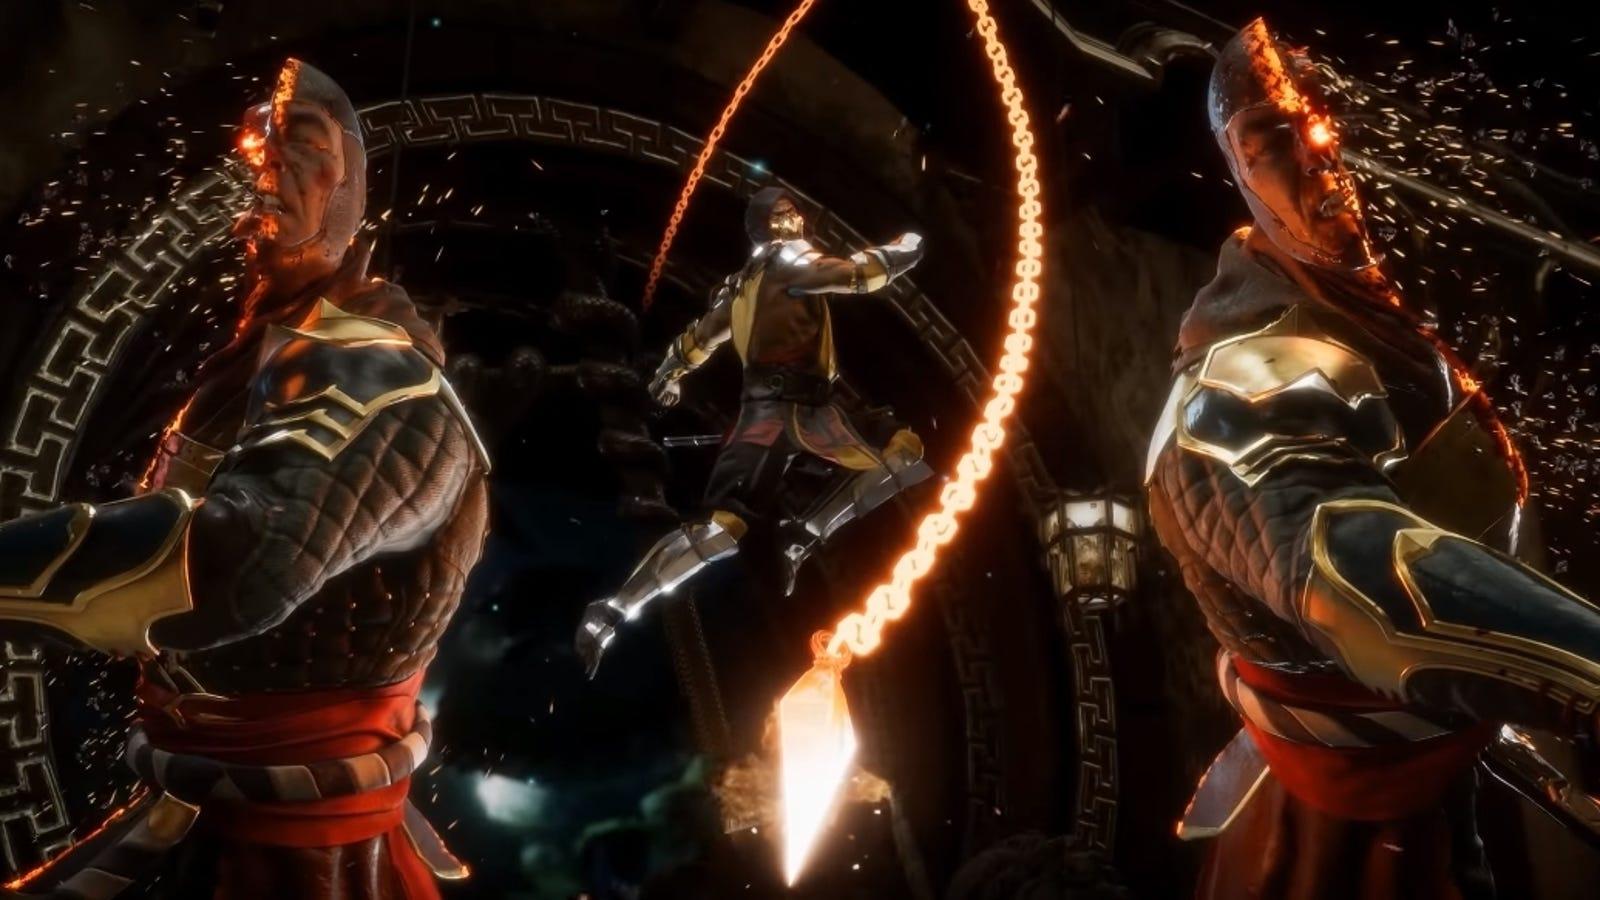 Mk11 Wallpaper: The Keys To A Good Mortal Kombat Fatality: Rhythm And Humor